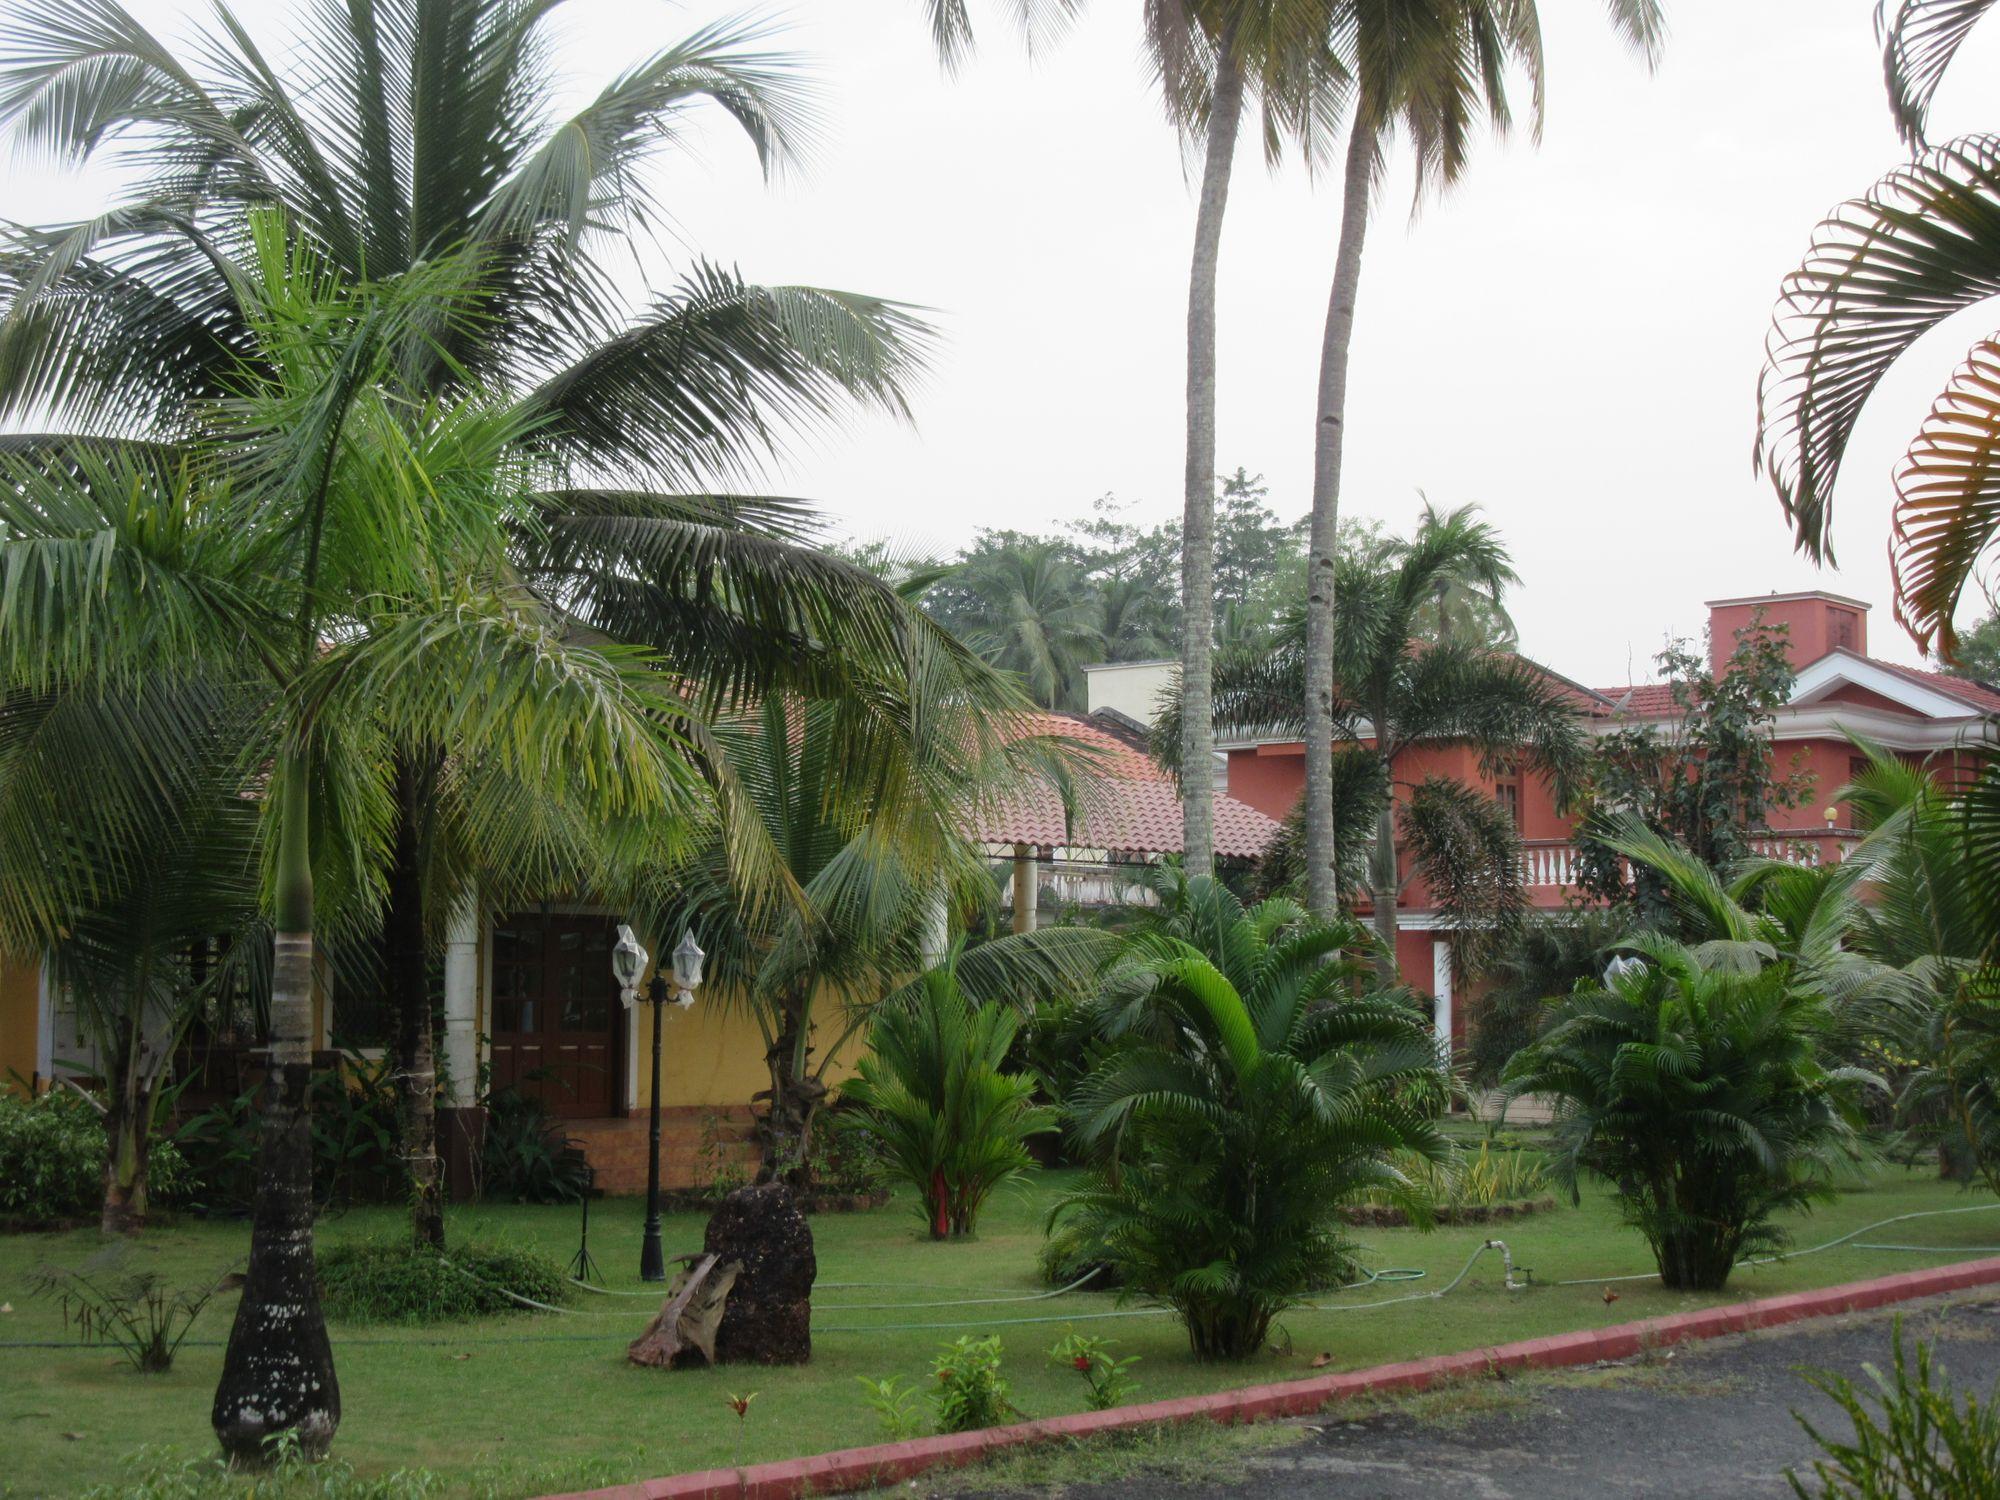 William's home exchange in Goa, India